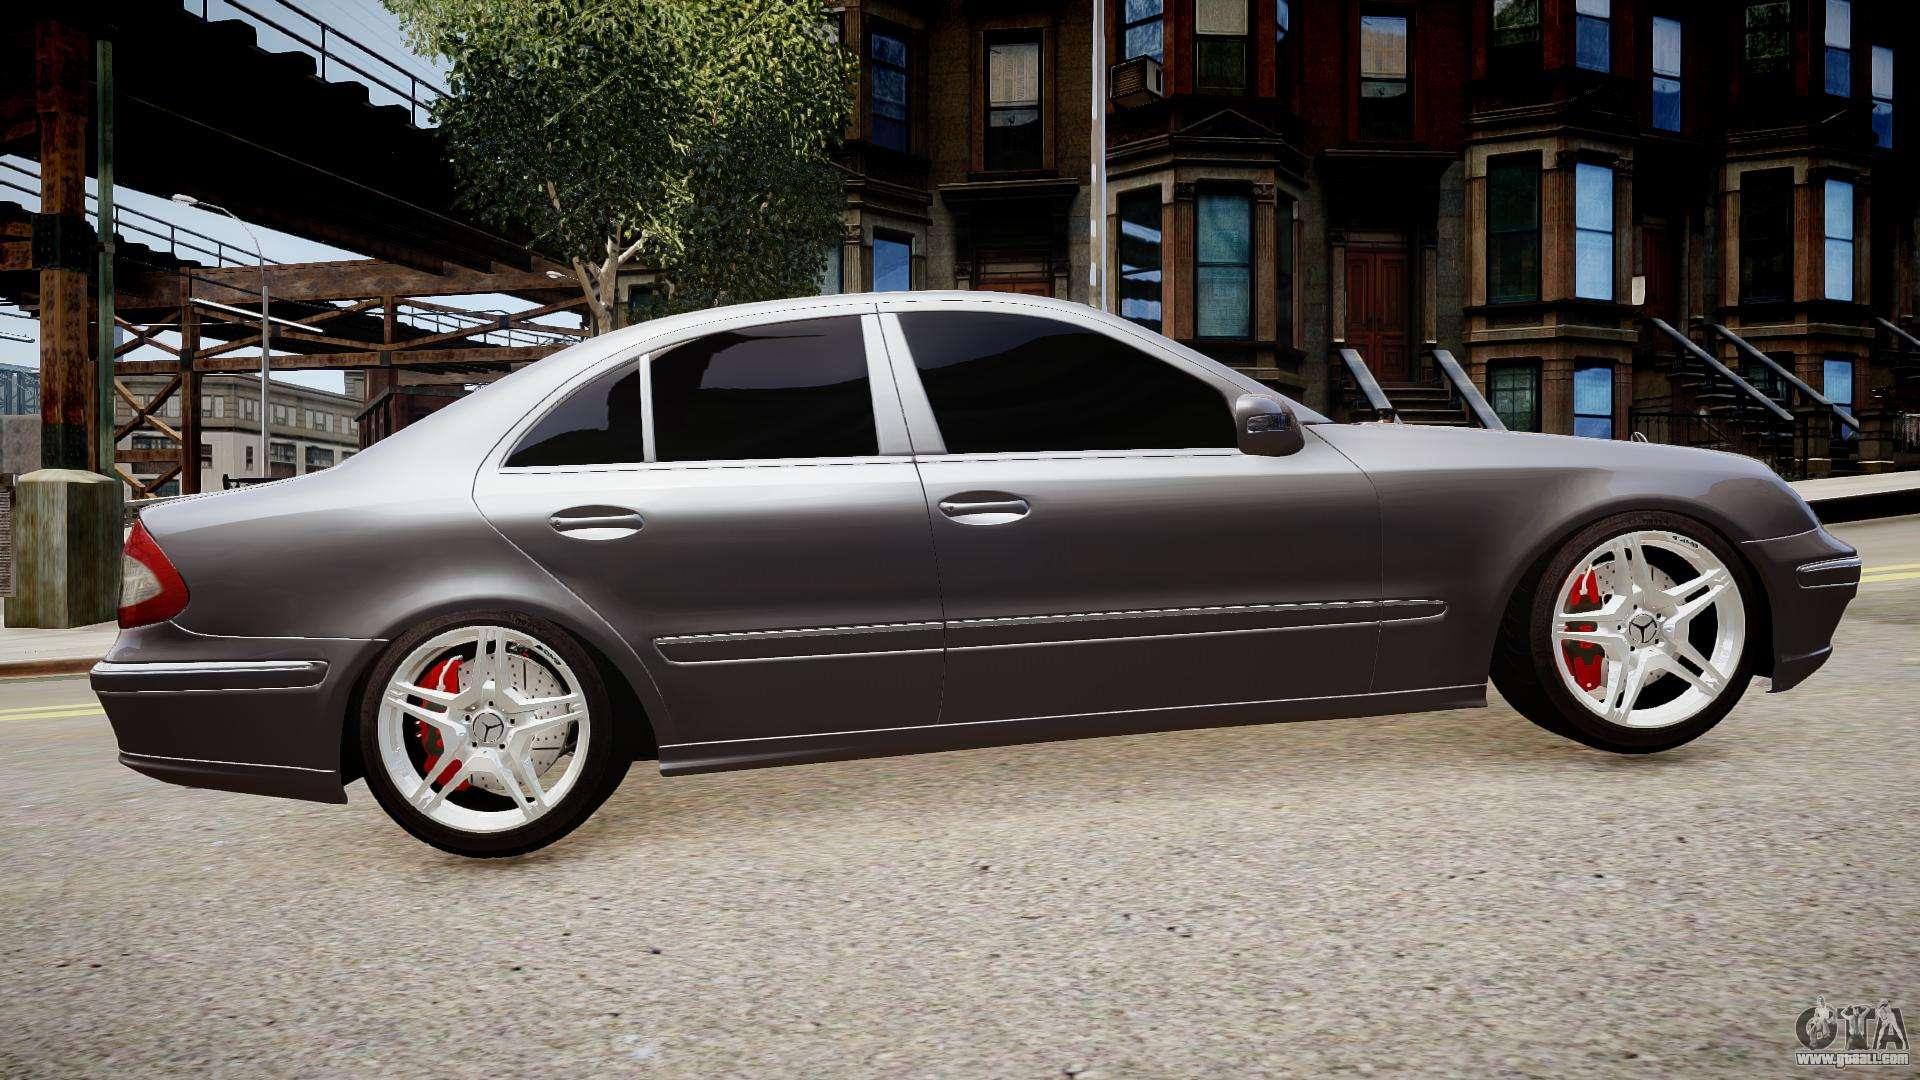 Mercedes benz amg e320 w211 for gta 4 for E320 mercedes benz